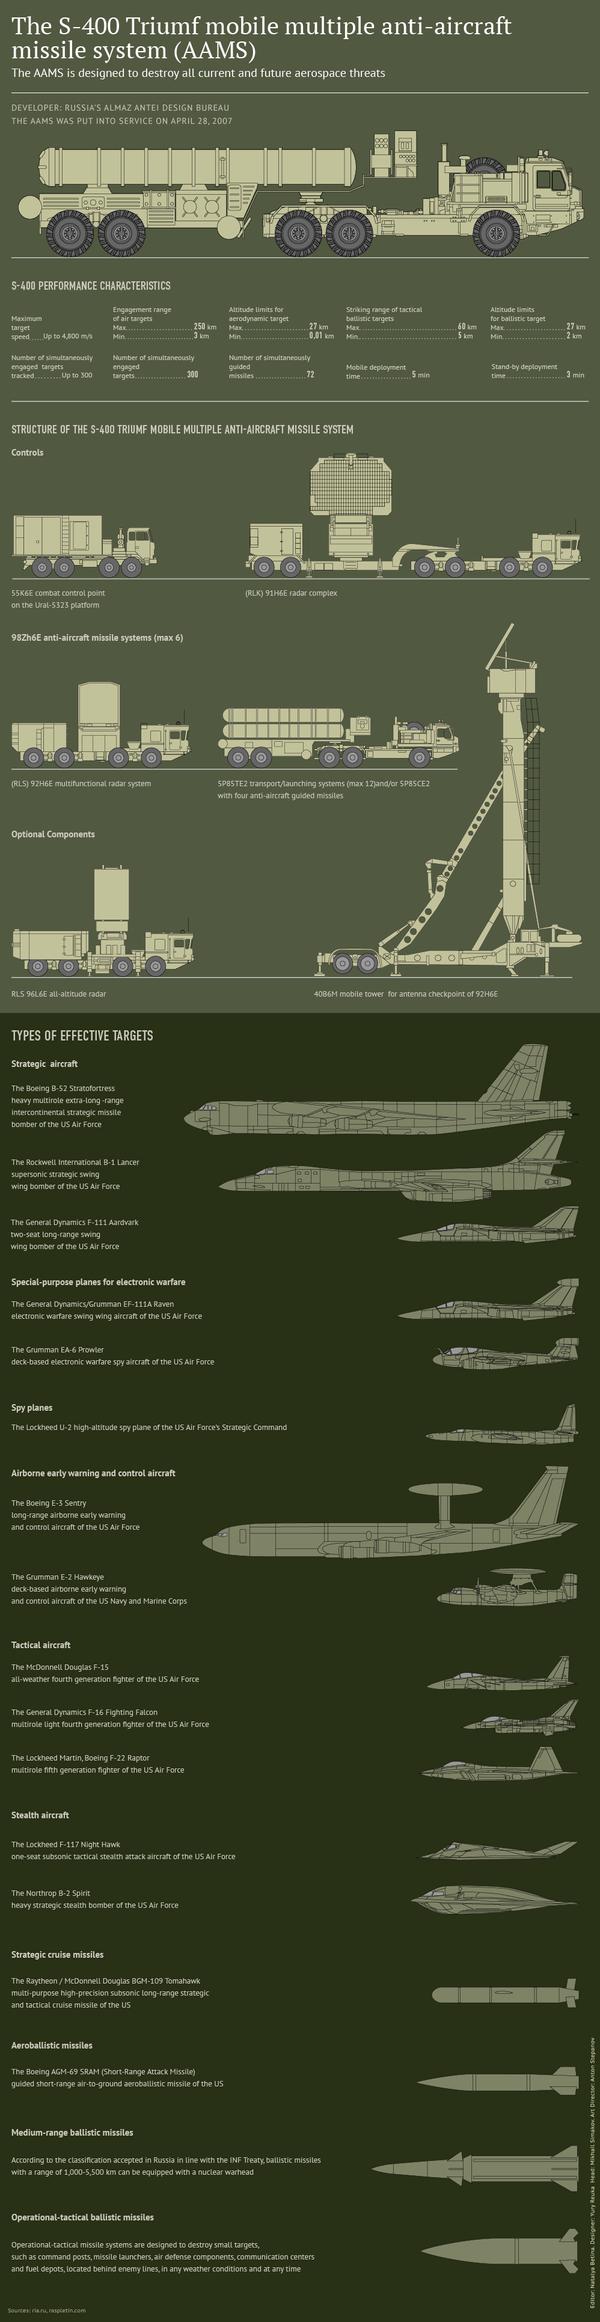 The S-400 Triumf Mobile Multiple Anti-Aircraft Missile System (AAMS) - Sputnik International